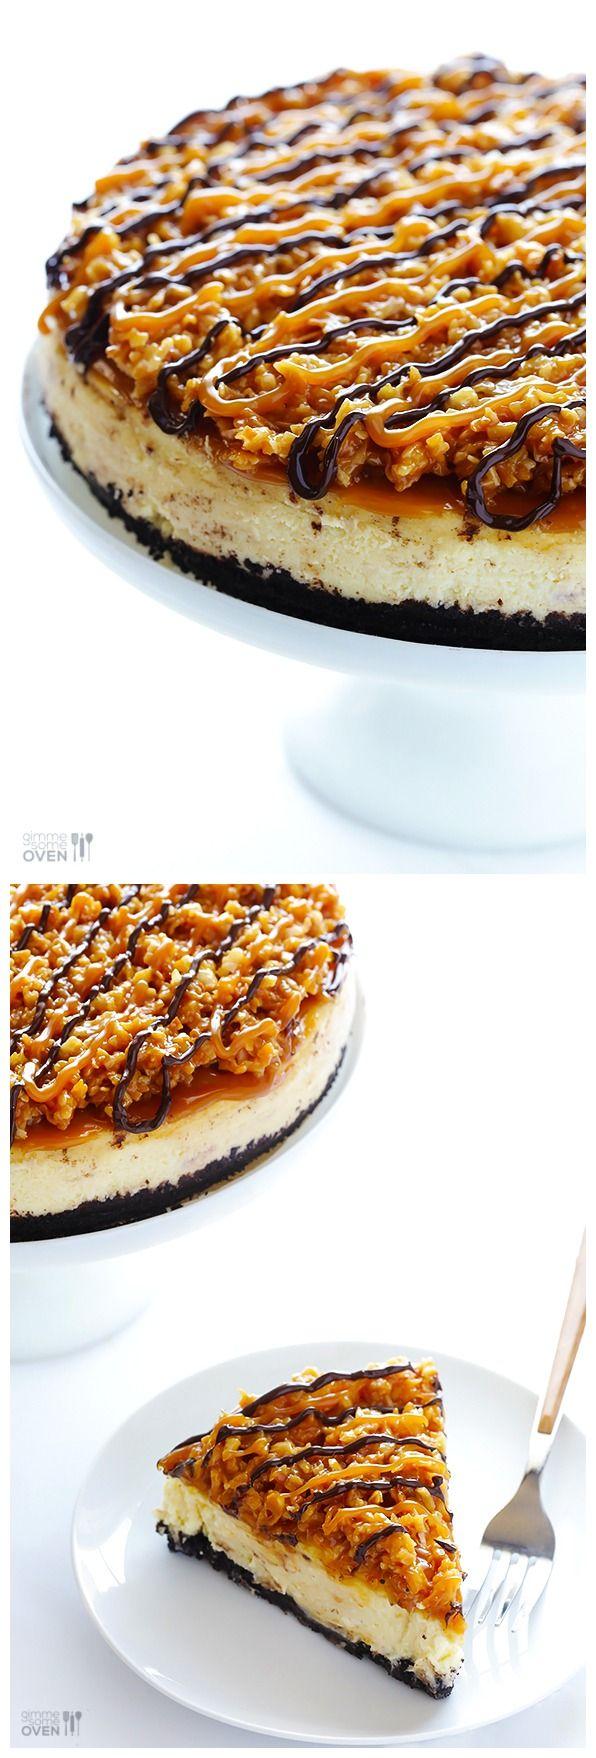 SAMOA CHEESECAKE http://www.recipenatural.com/samoa-cheesecake/